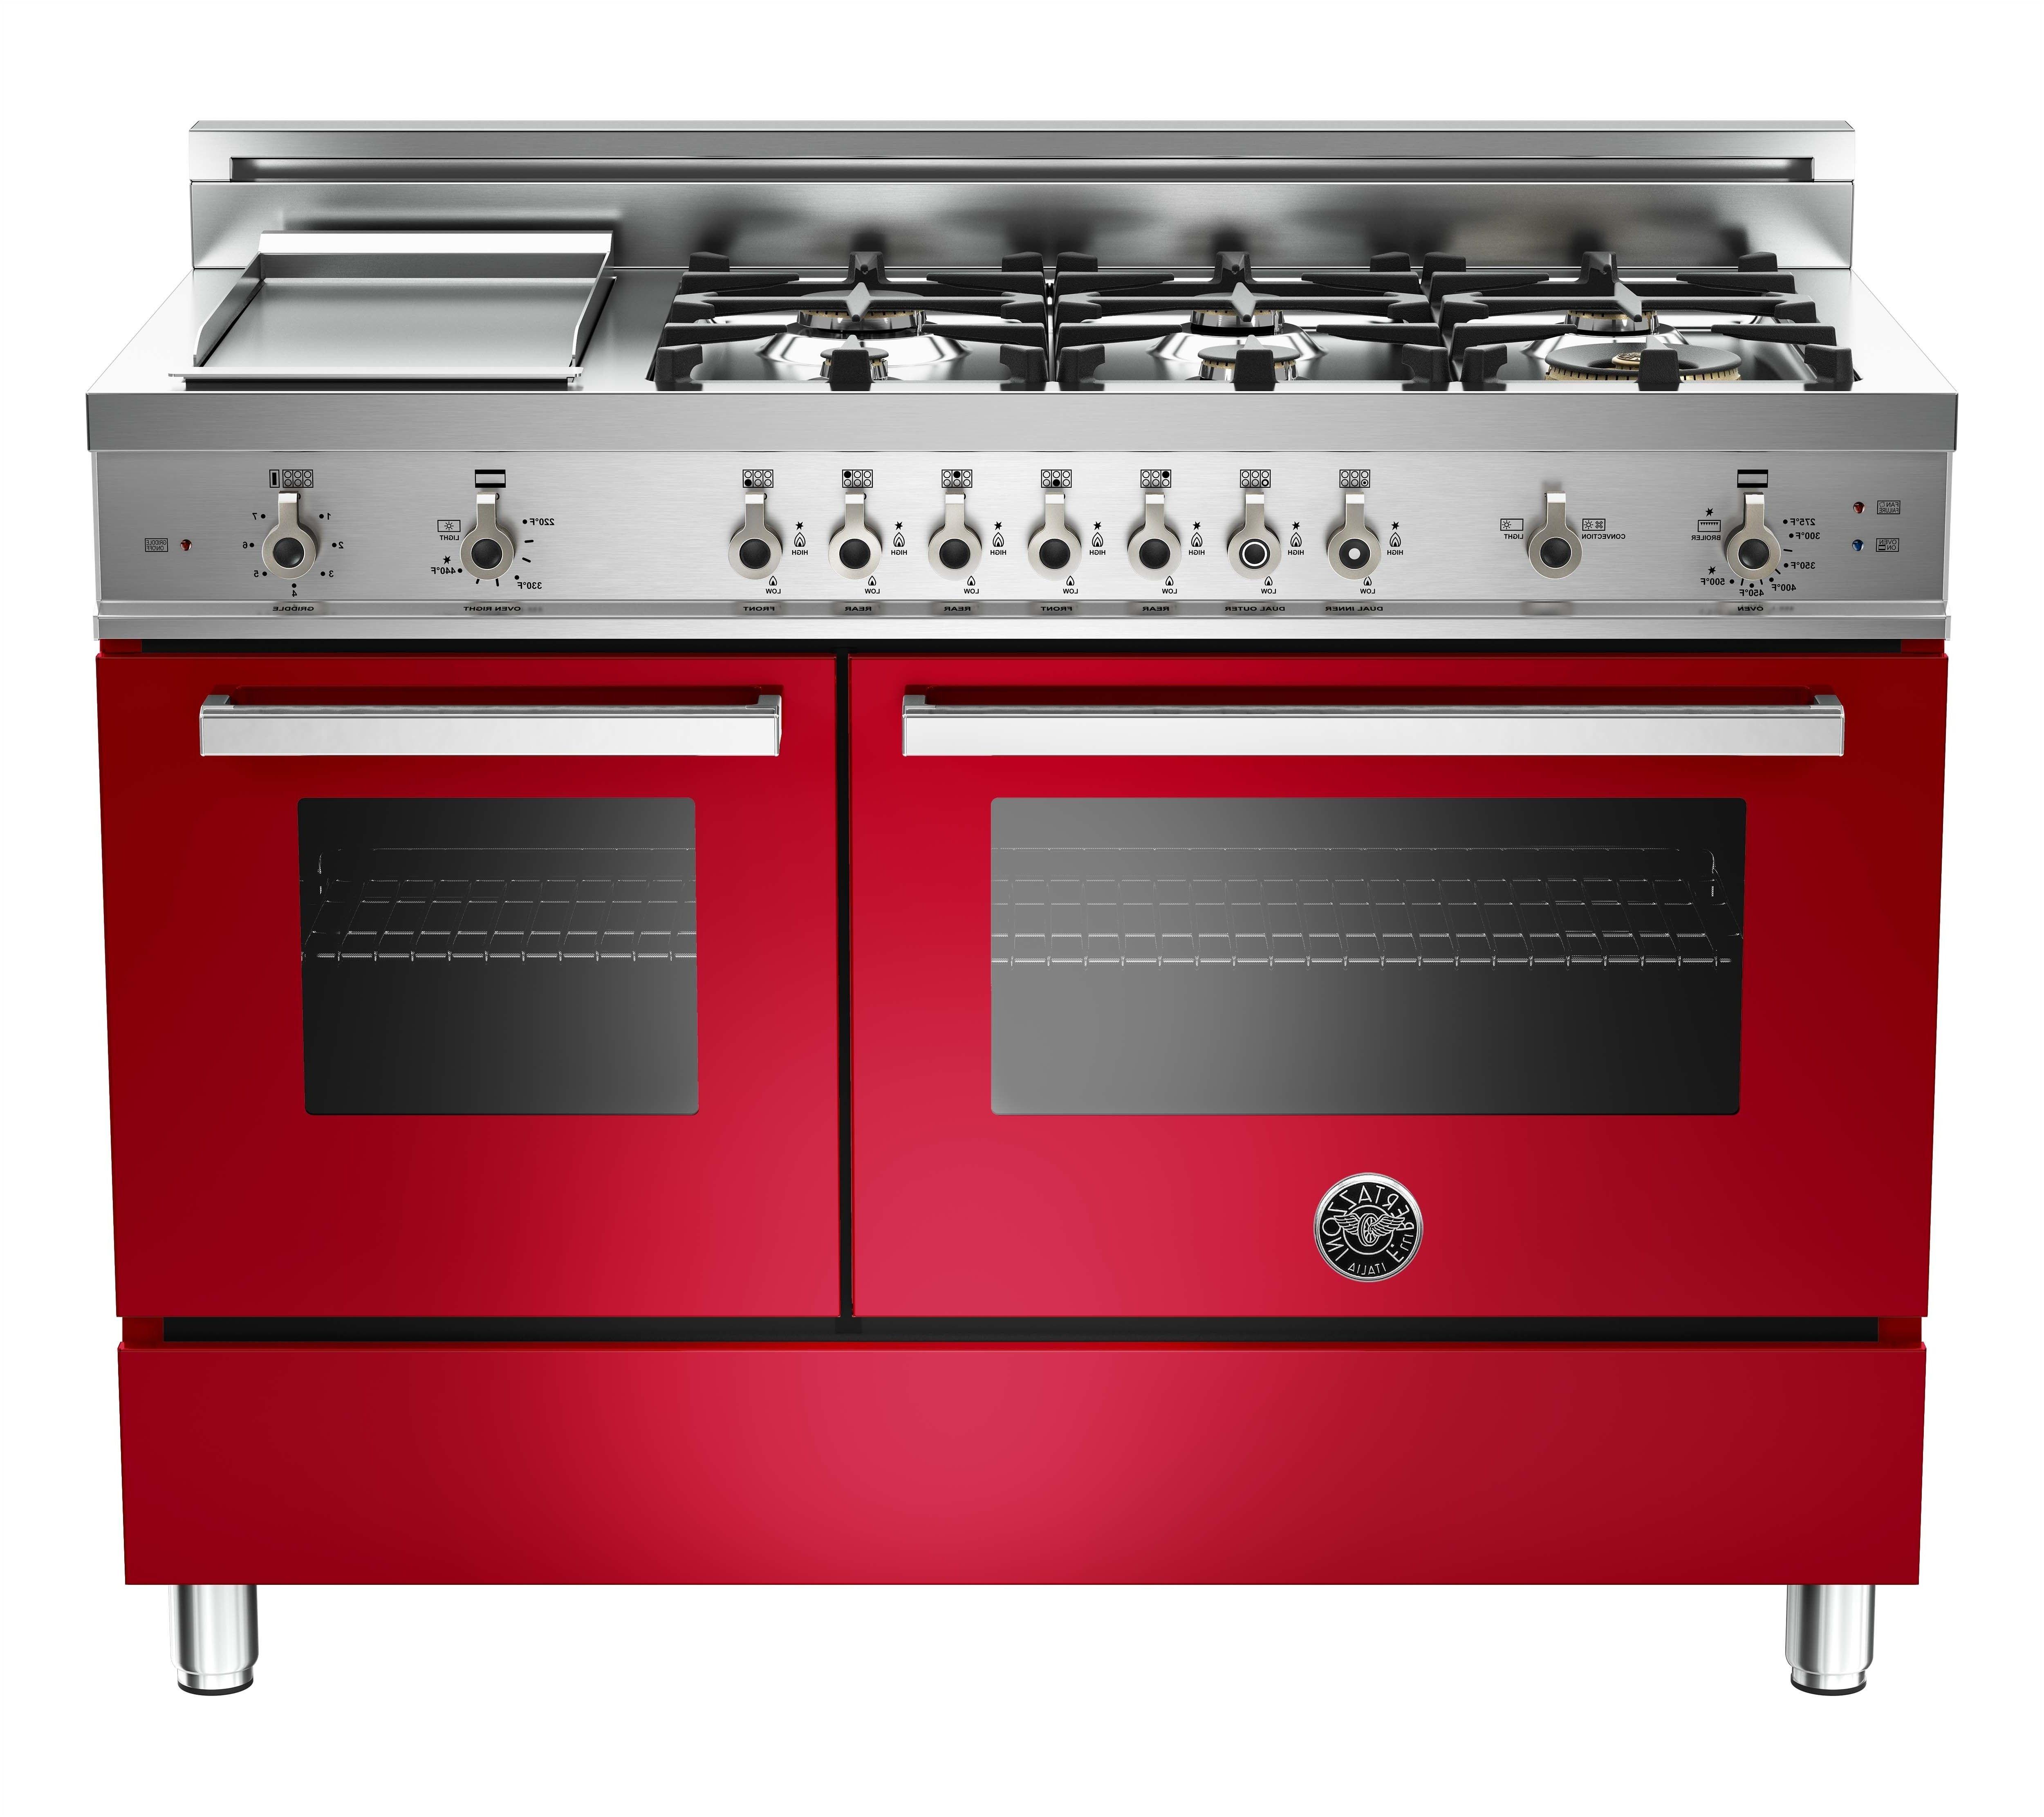 best kitchen appliance brand nutone exhaust fans wall mount luxury brands photos architectural digest from